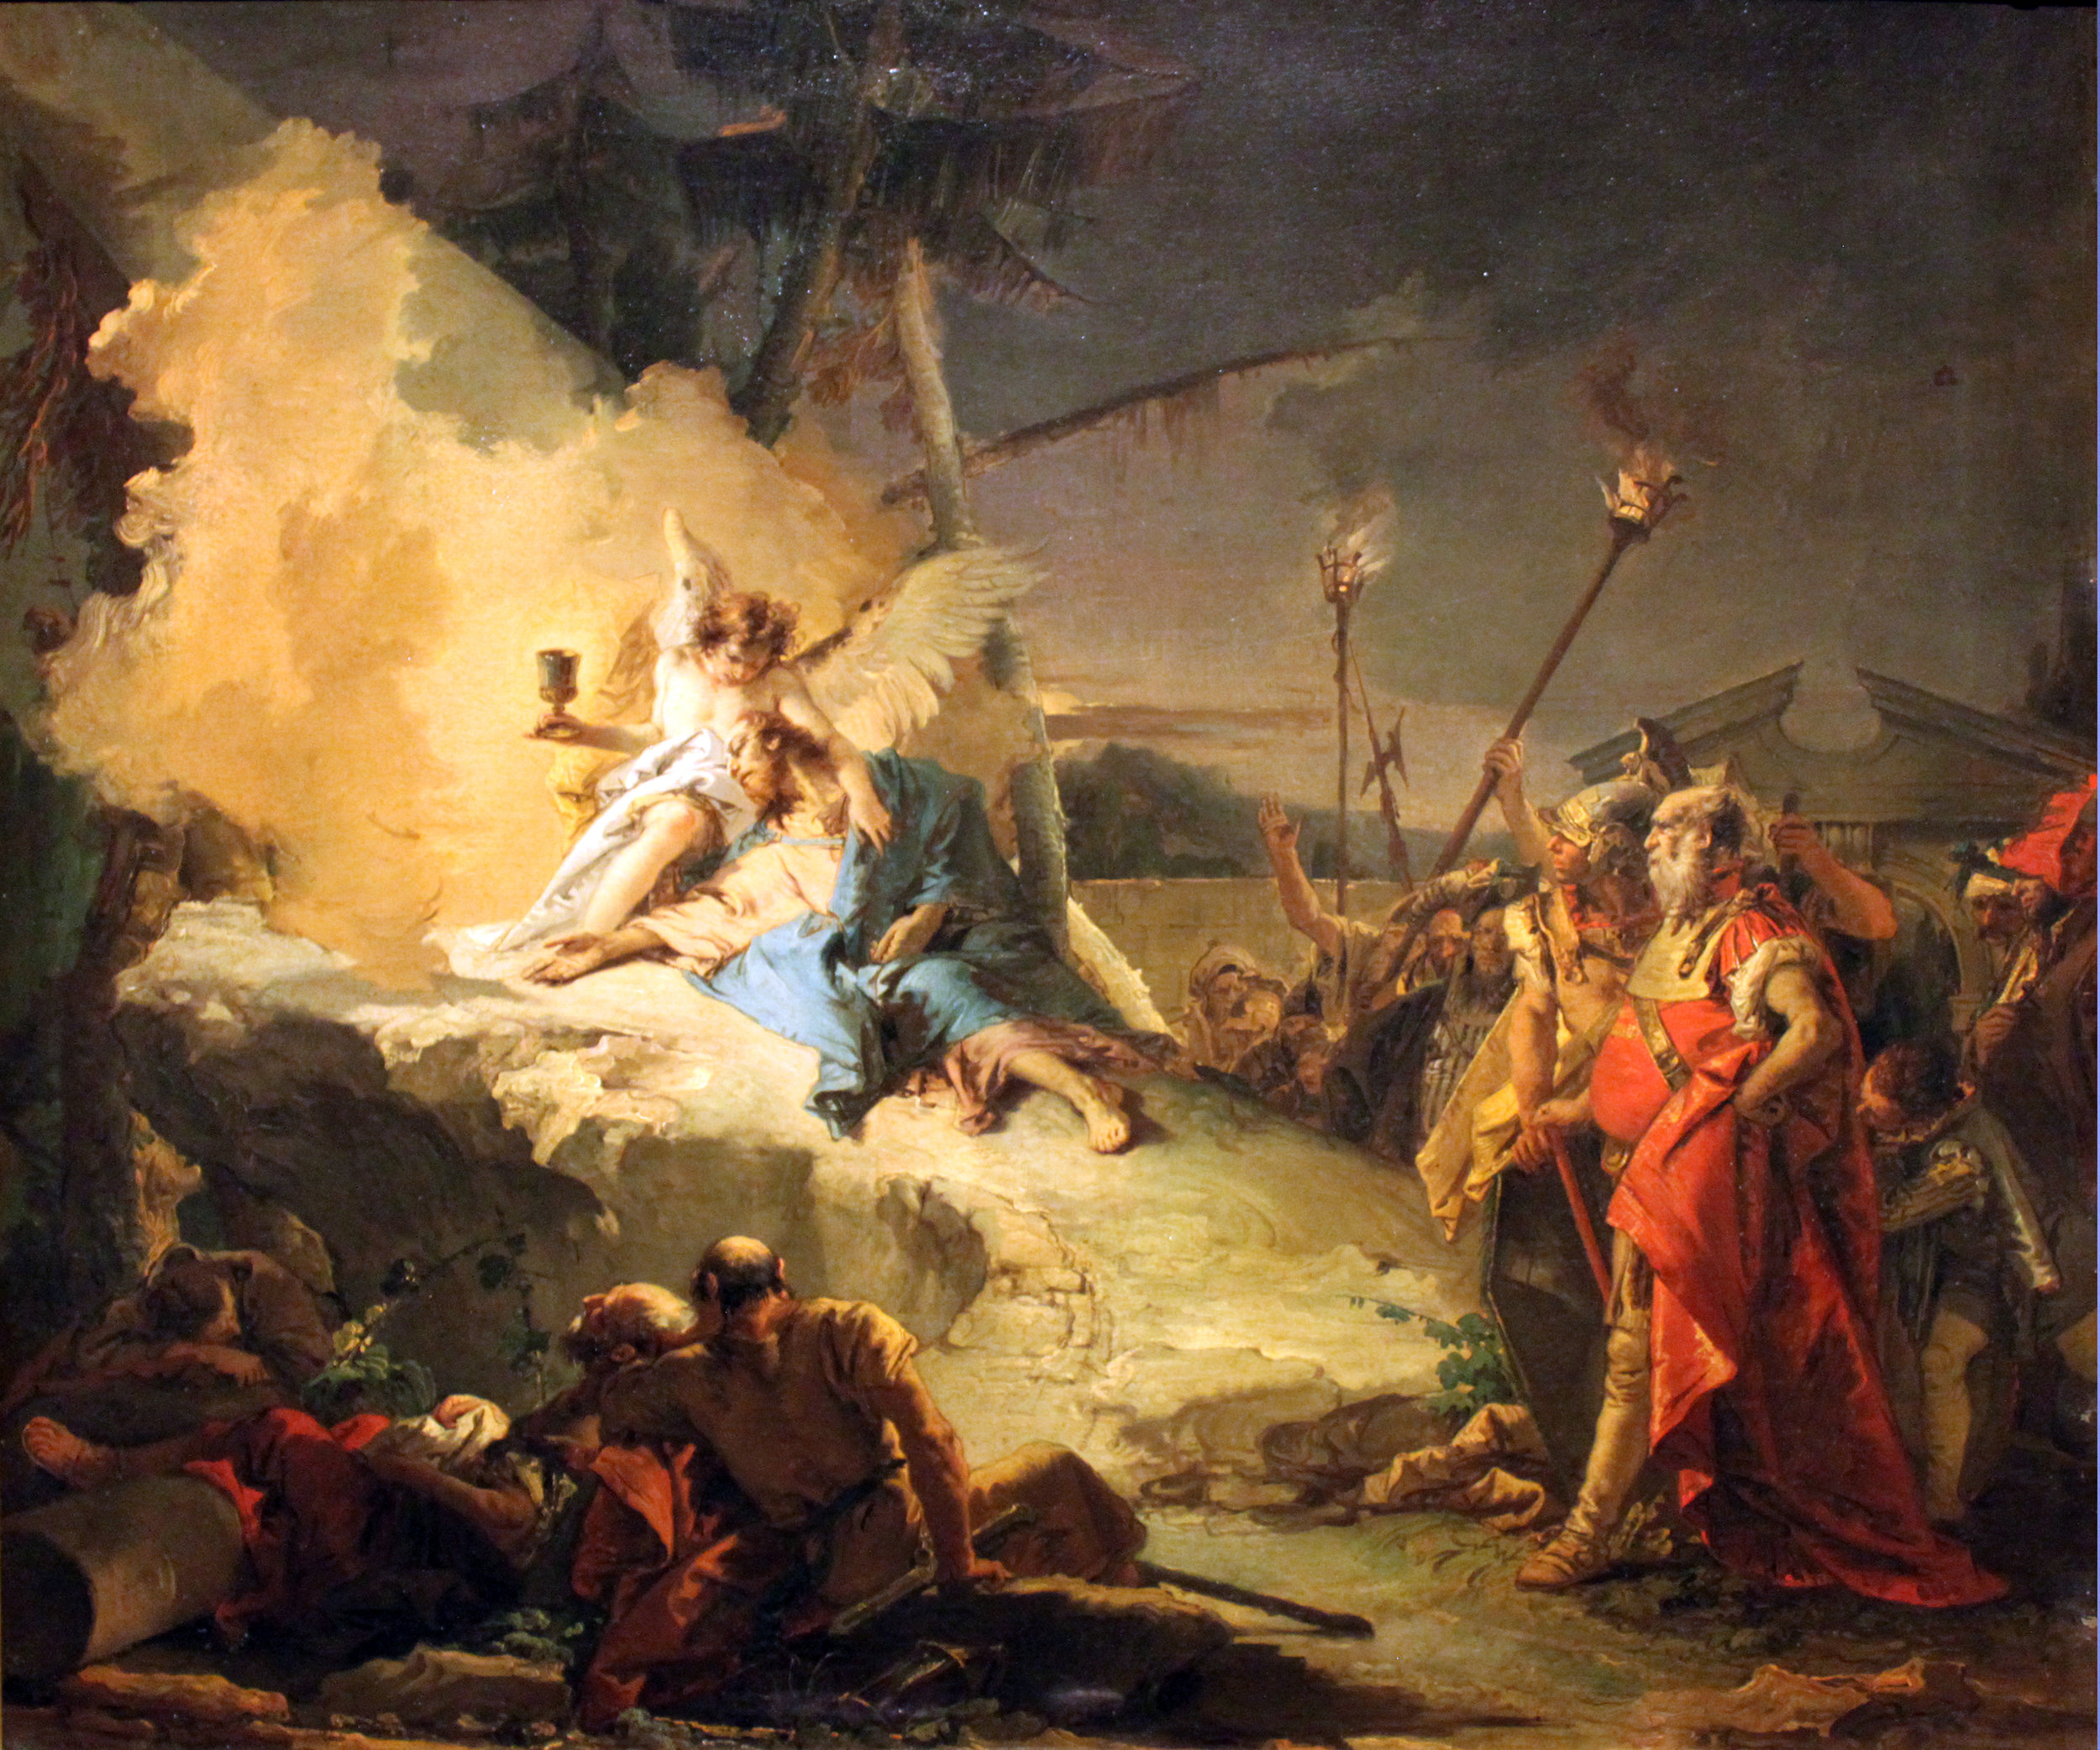 1753_Tiepolo_Christus_in_Gethsemane_anagoria.jpg